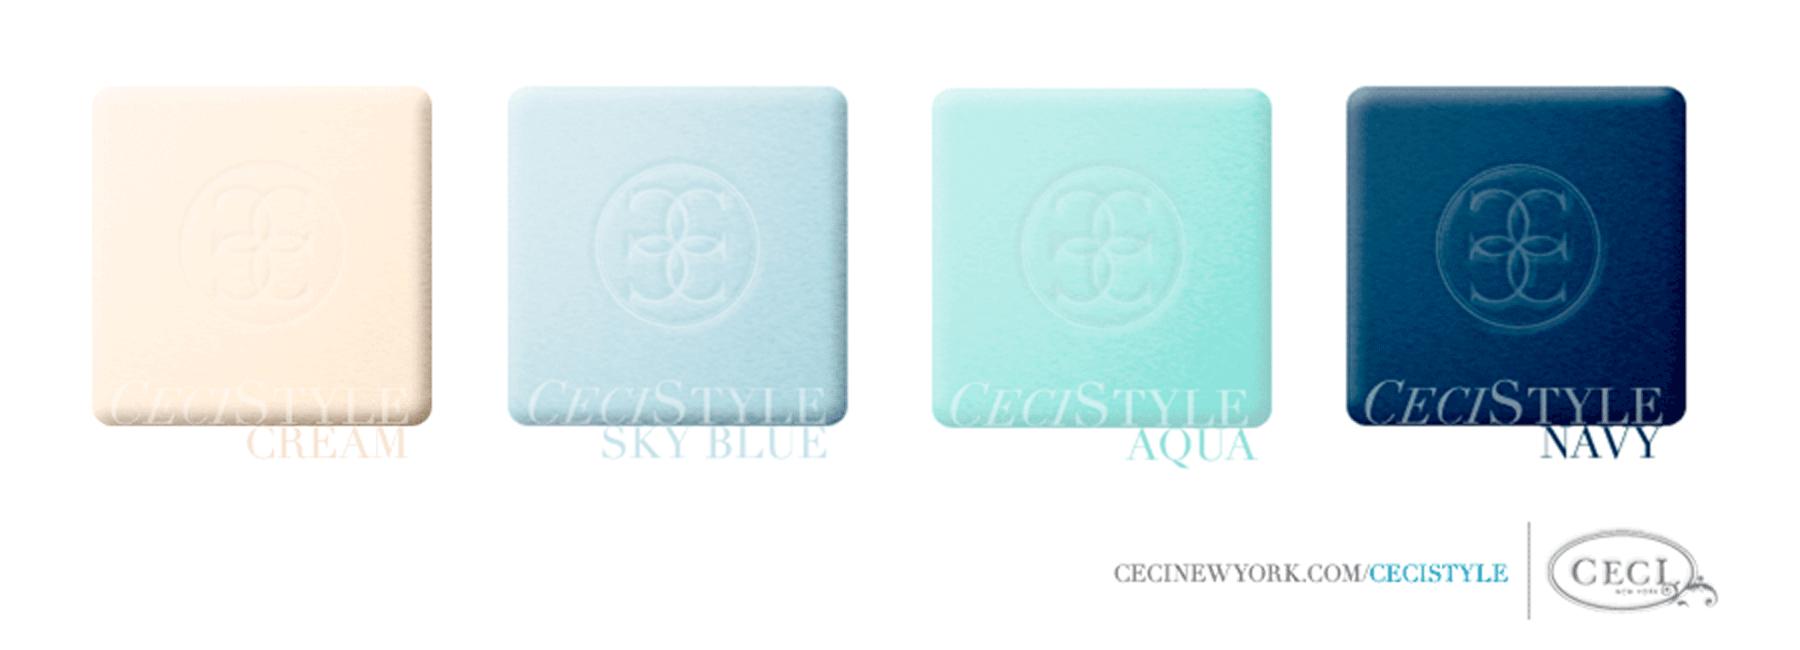 Ceci's Color Stories - Blue & Cream Wedding Colors - color swatches, cream, sky blue, aqua, navy, wedding